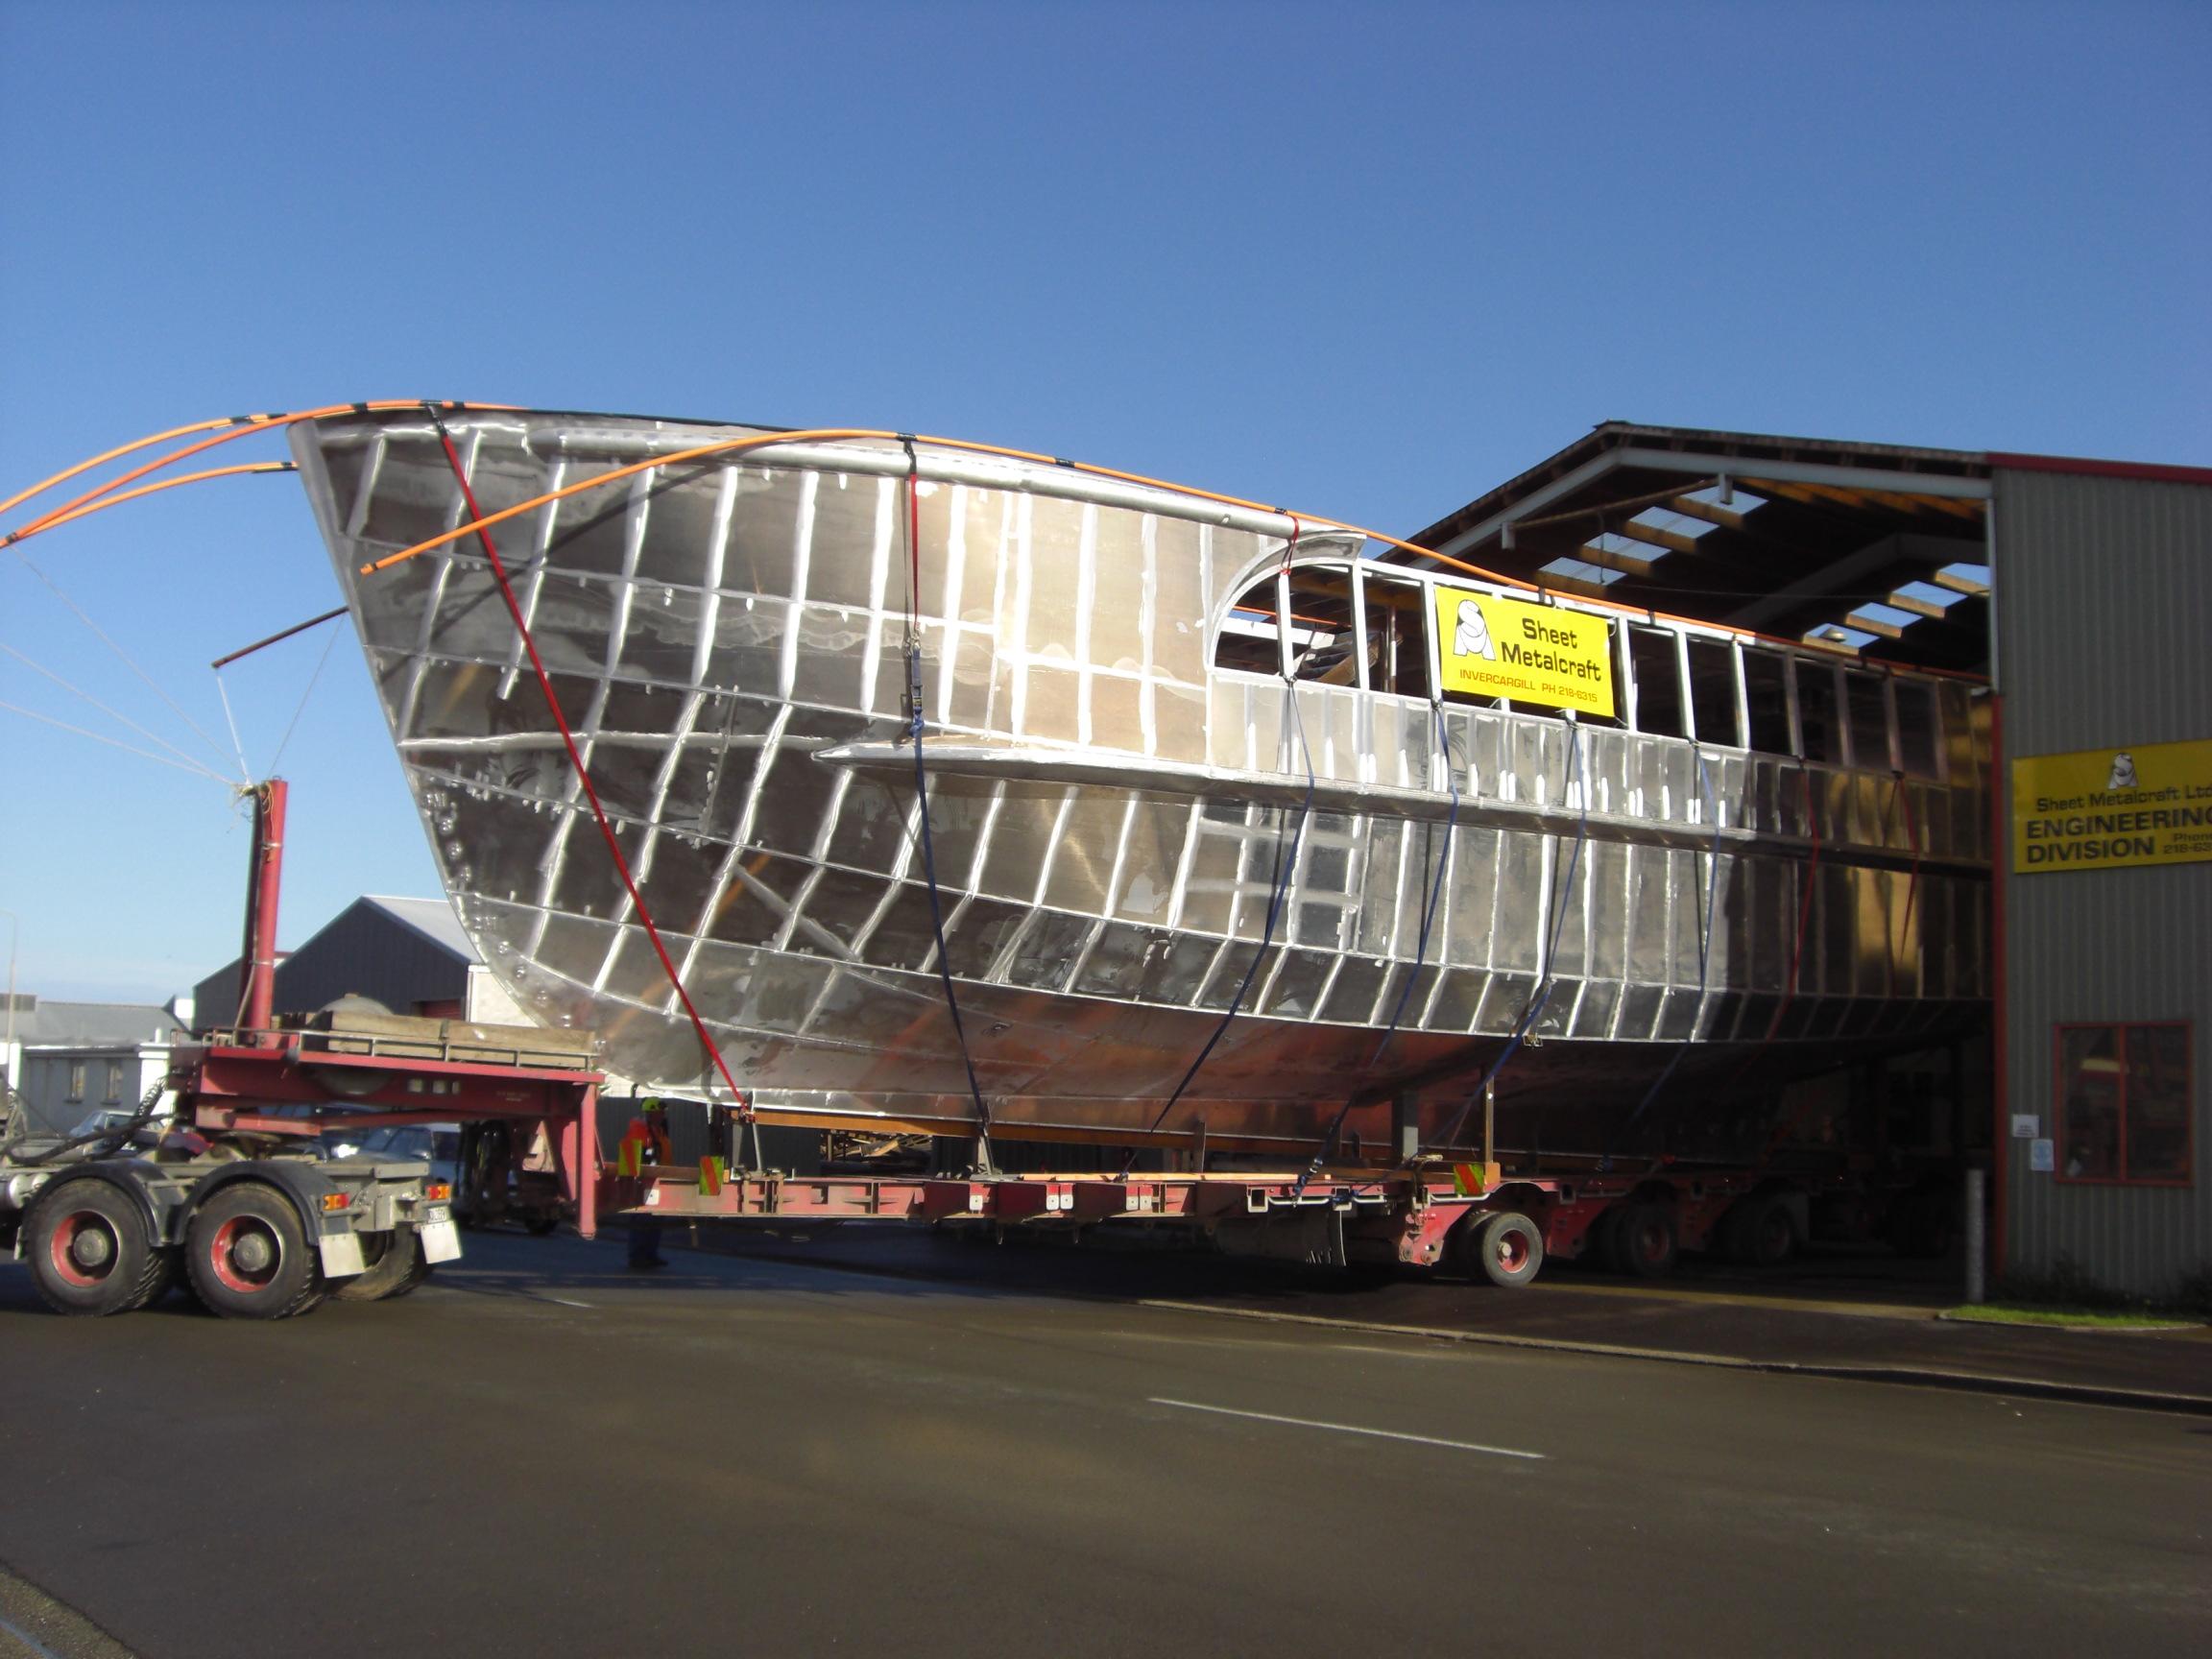 Milford Boat